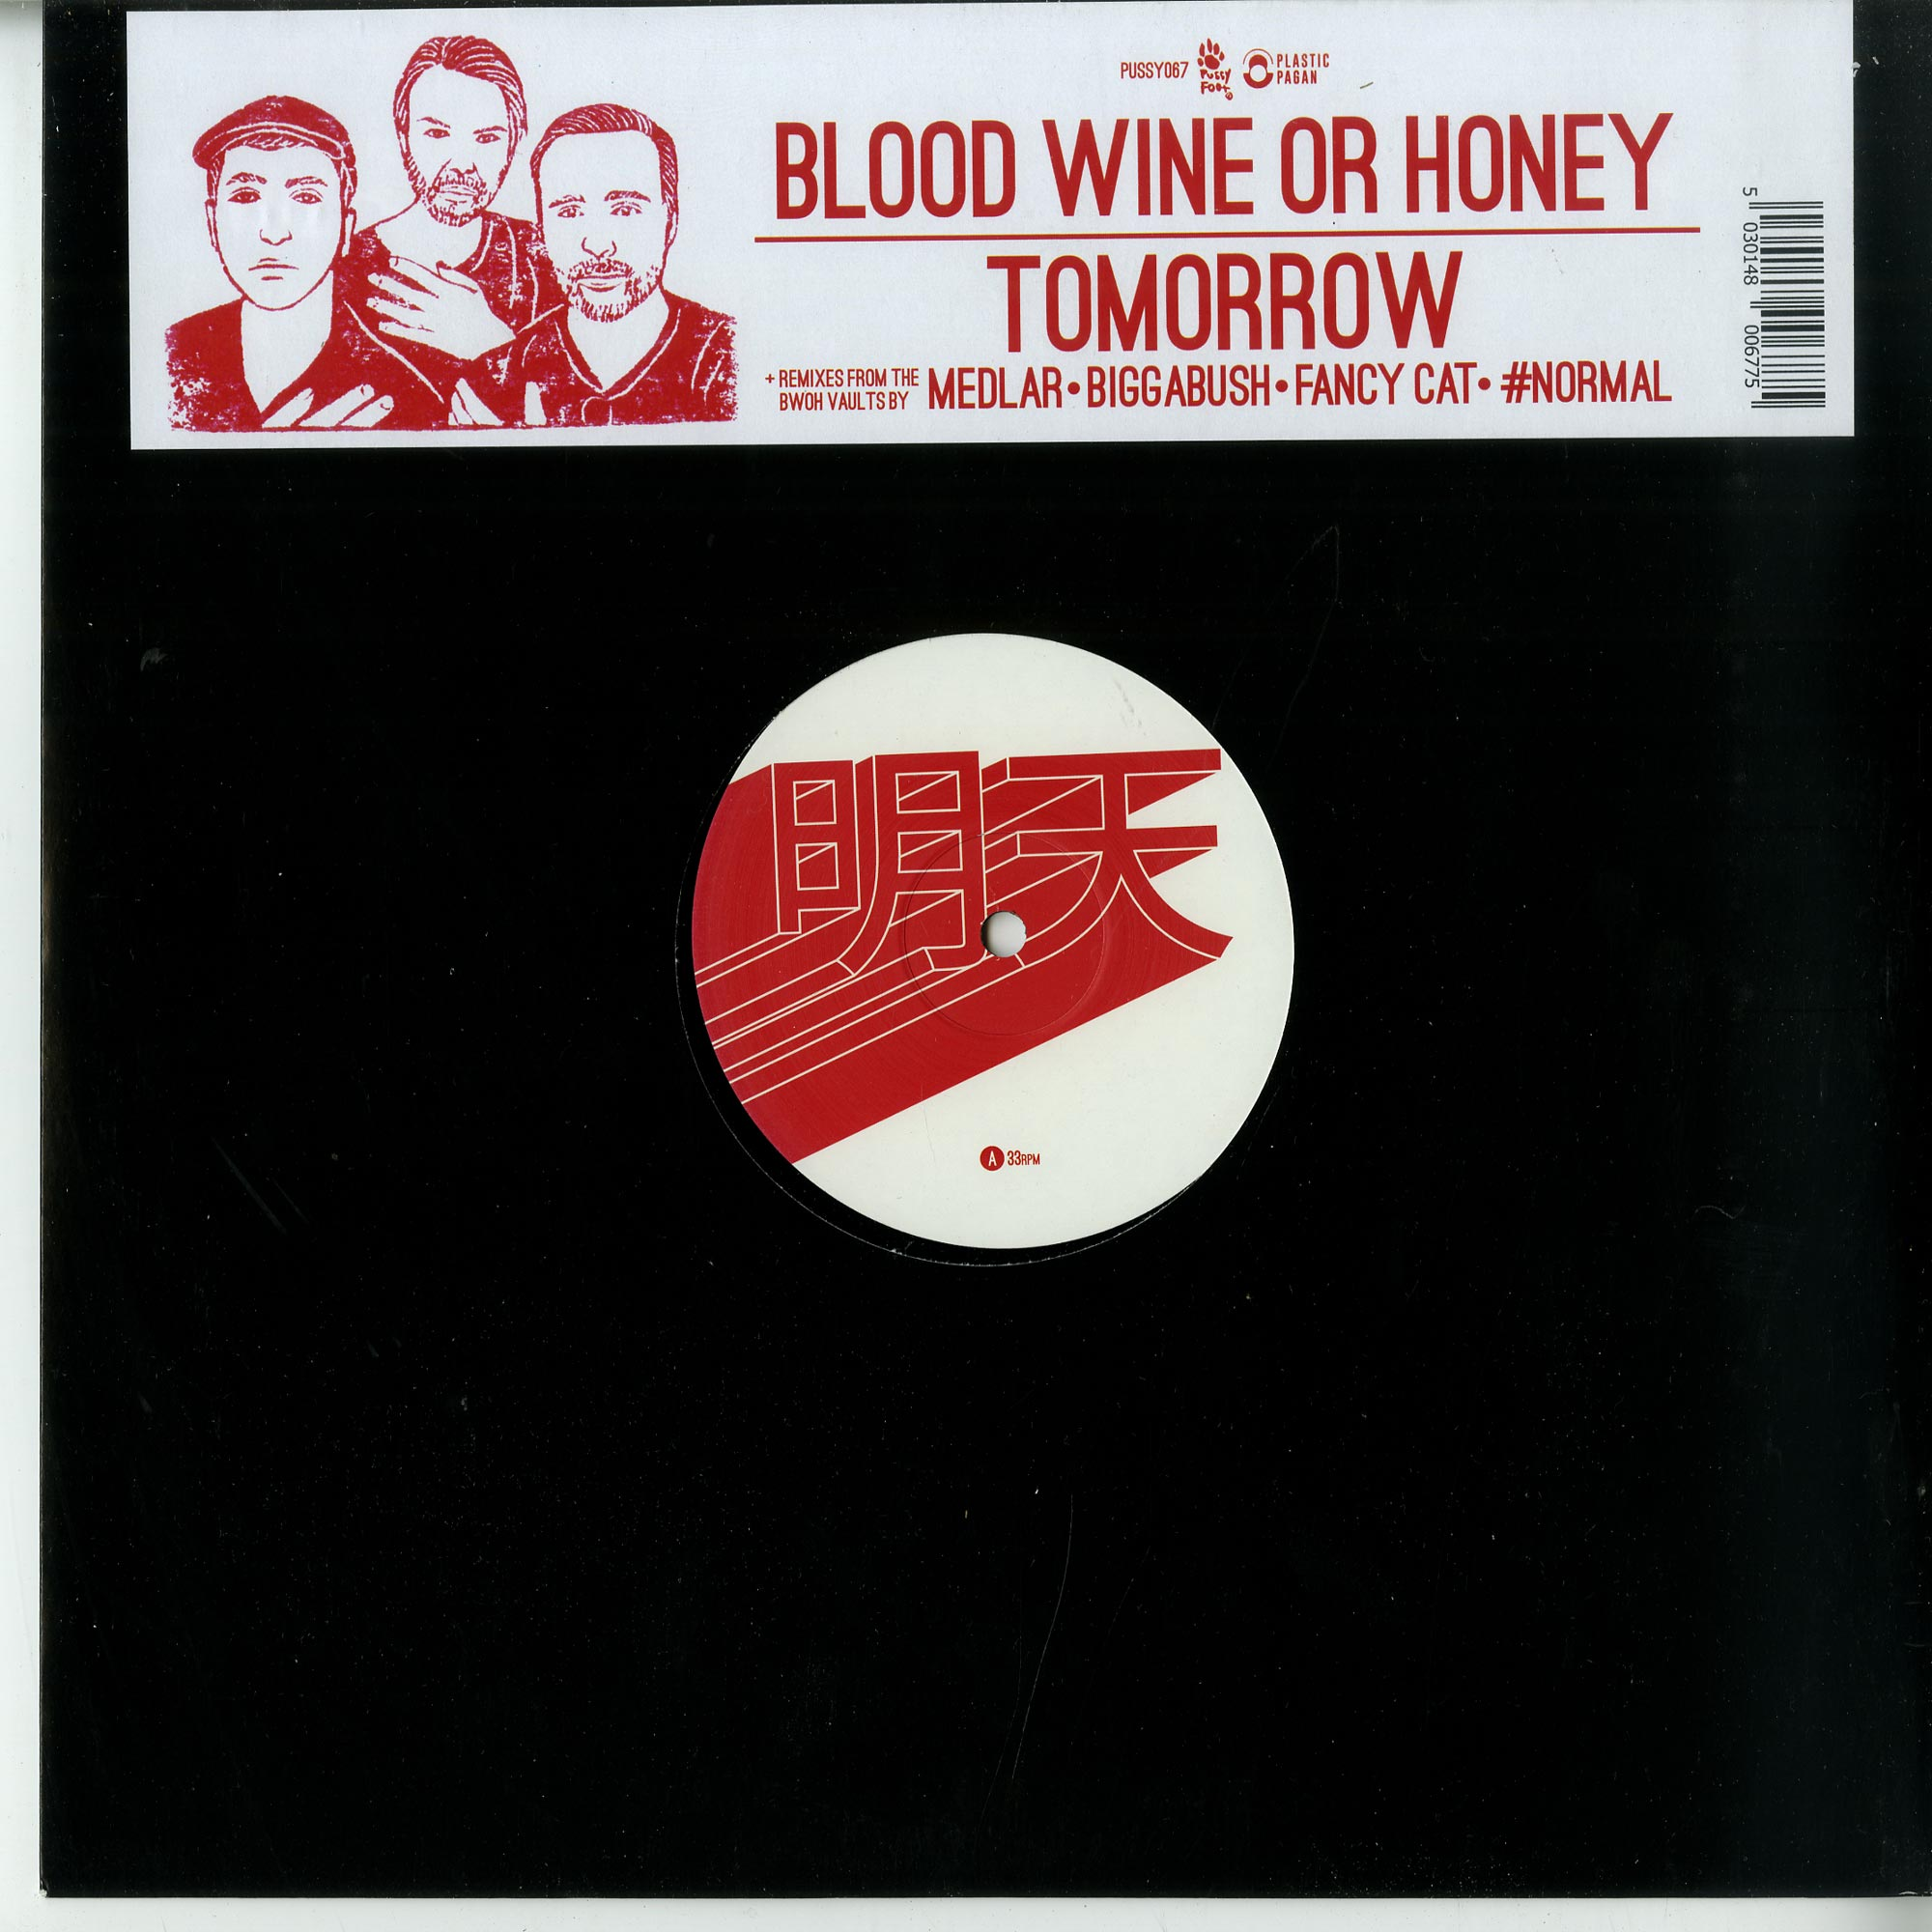 Blood Wine Or Honey - TOMORROW